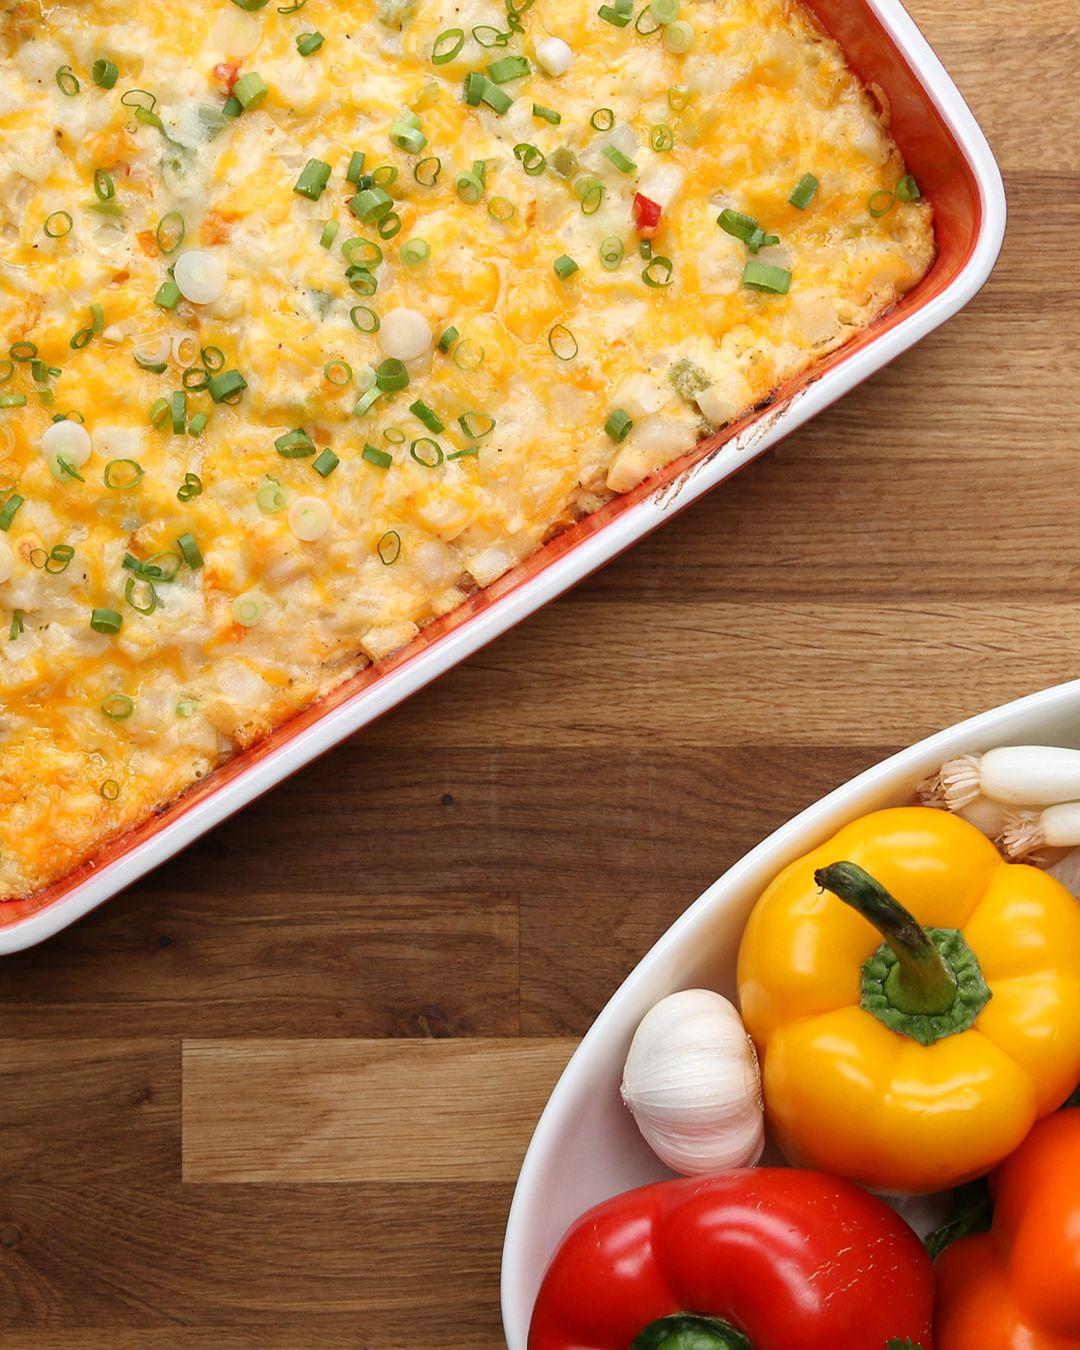 Western Sweet Dishes Recipes: These Cheesy Fajita Potatoes Are Too Good To Be True